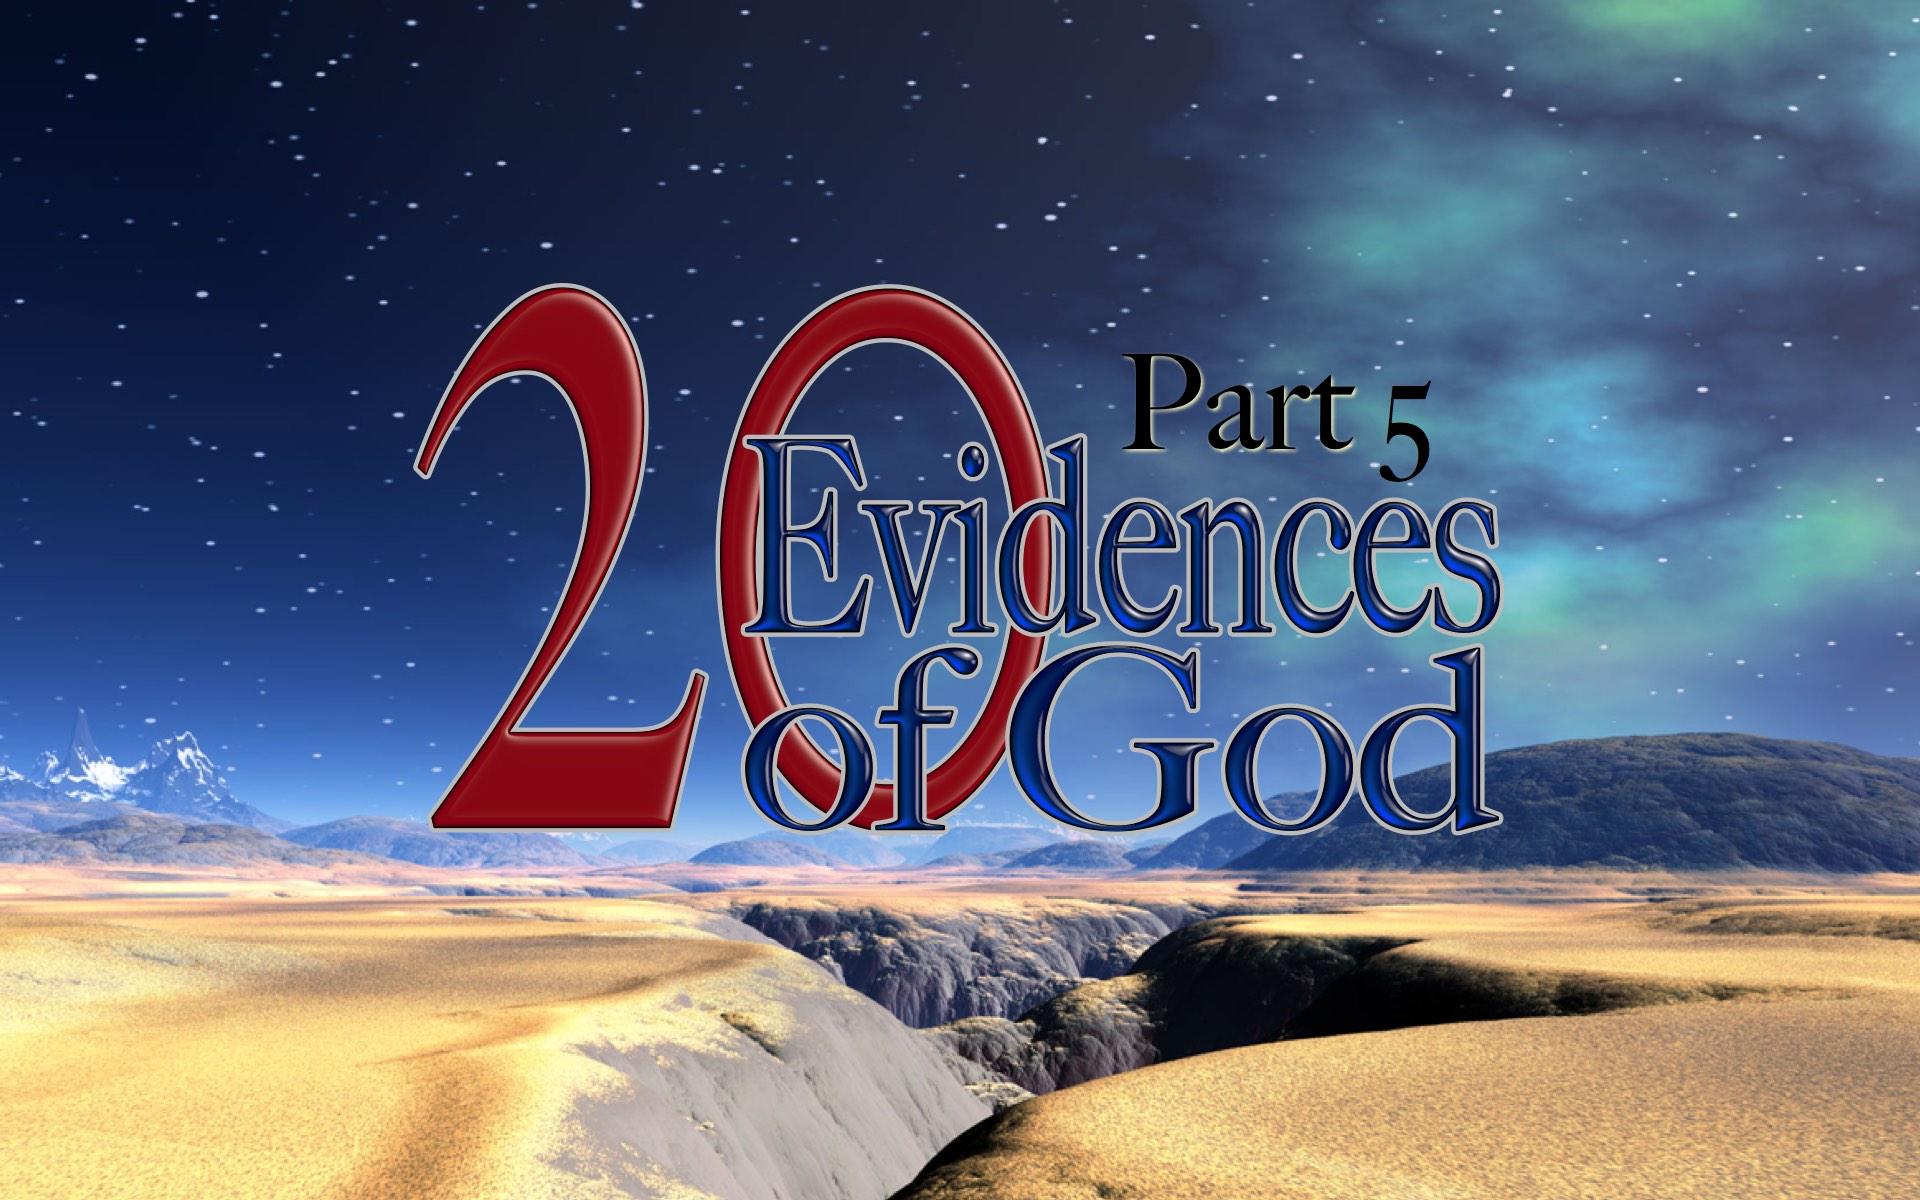 20 Evidences of God Part 5